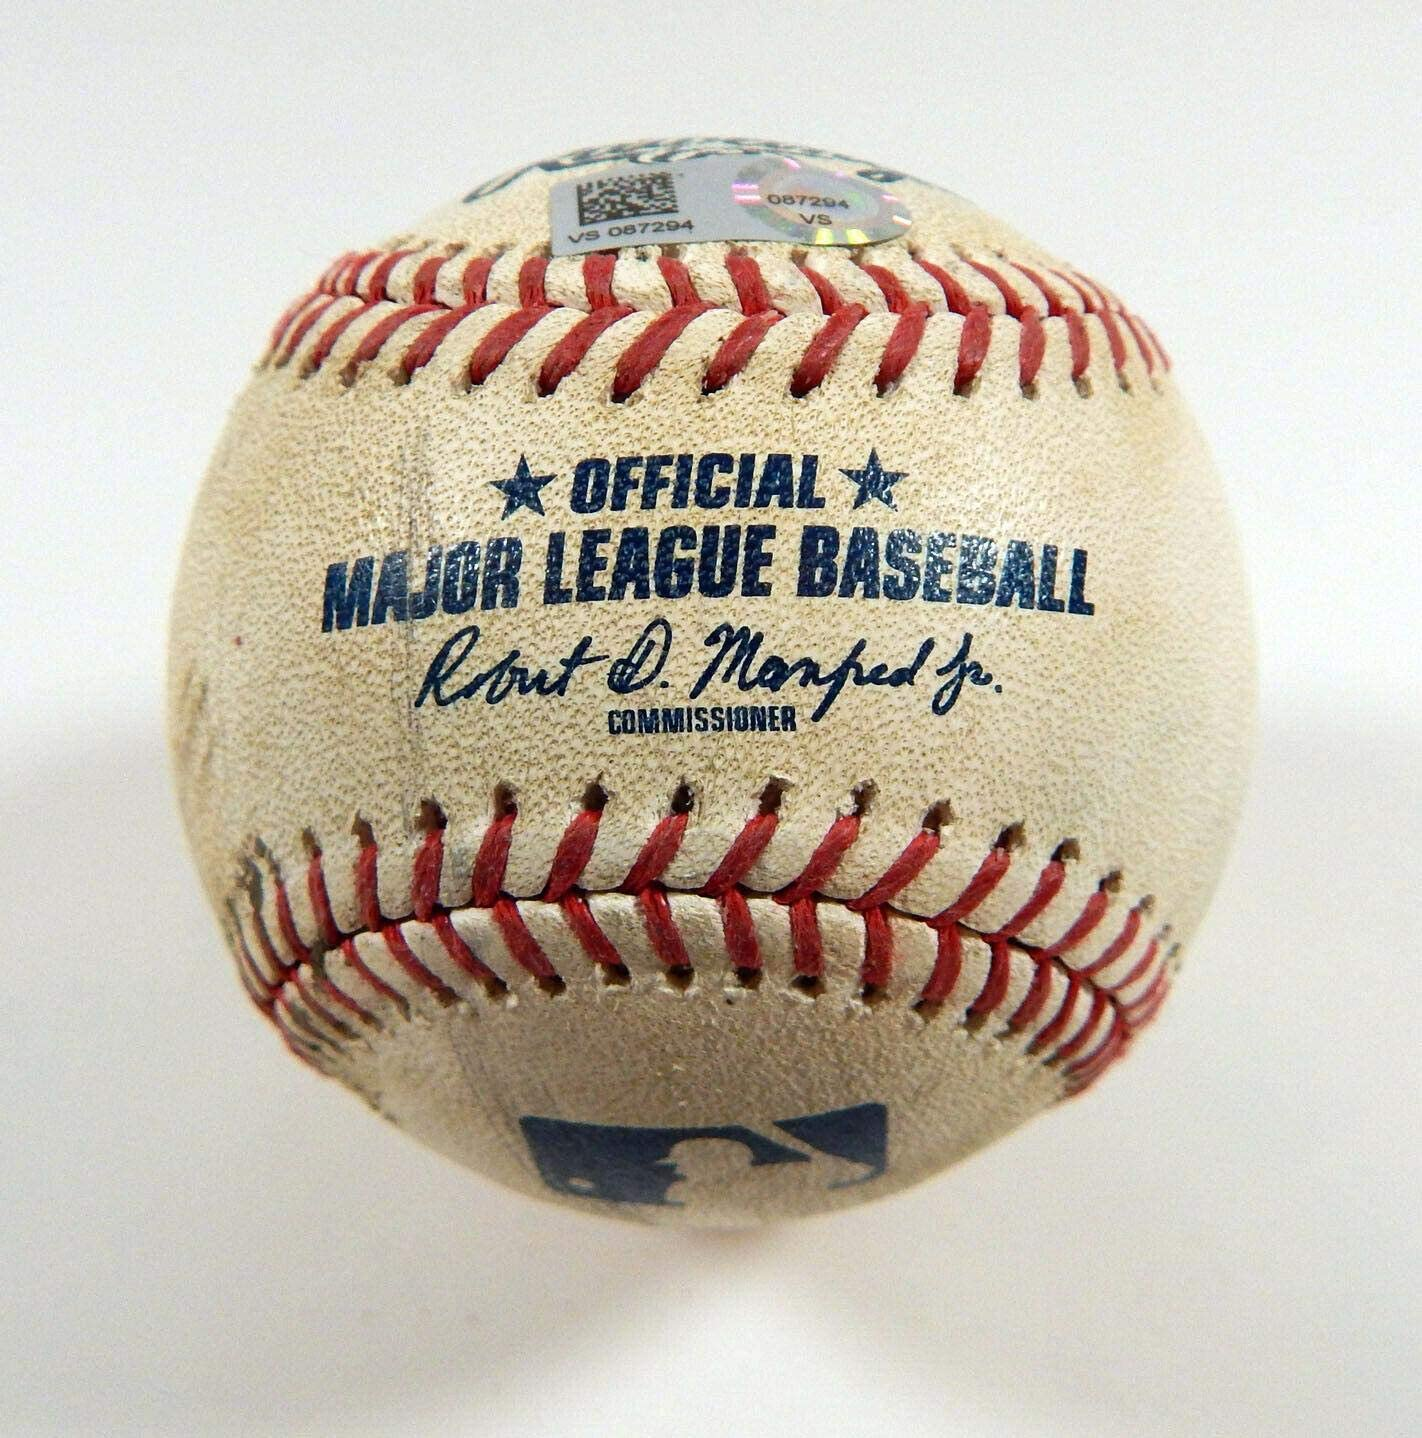 2019 Arizona Diamondbacks At Colorado Rockies Game Used Baseball McMahon Foul - Game Used Baseballs